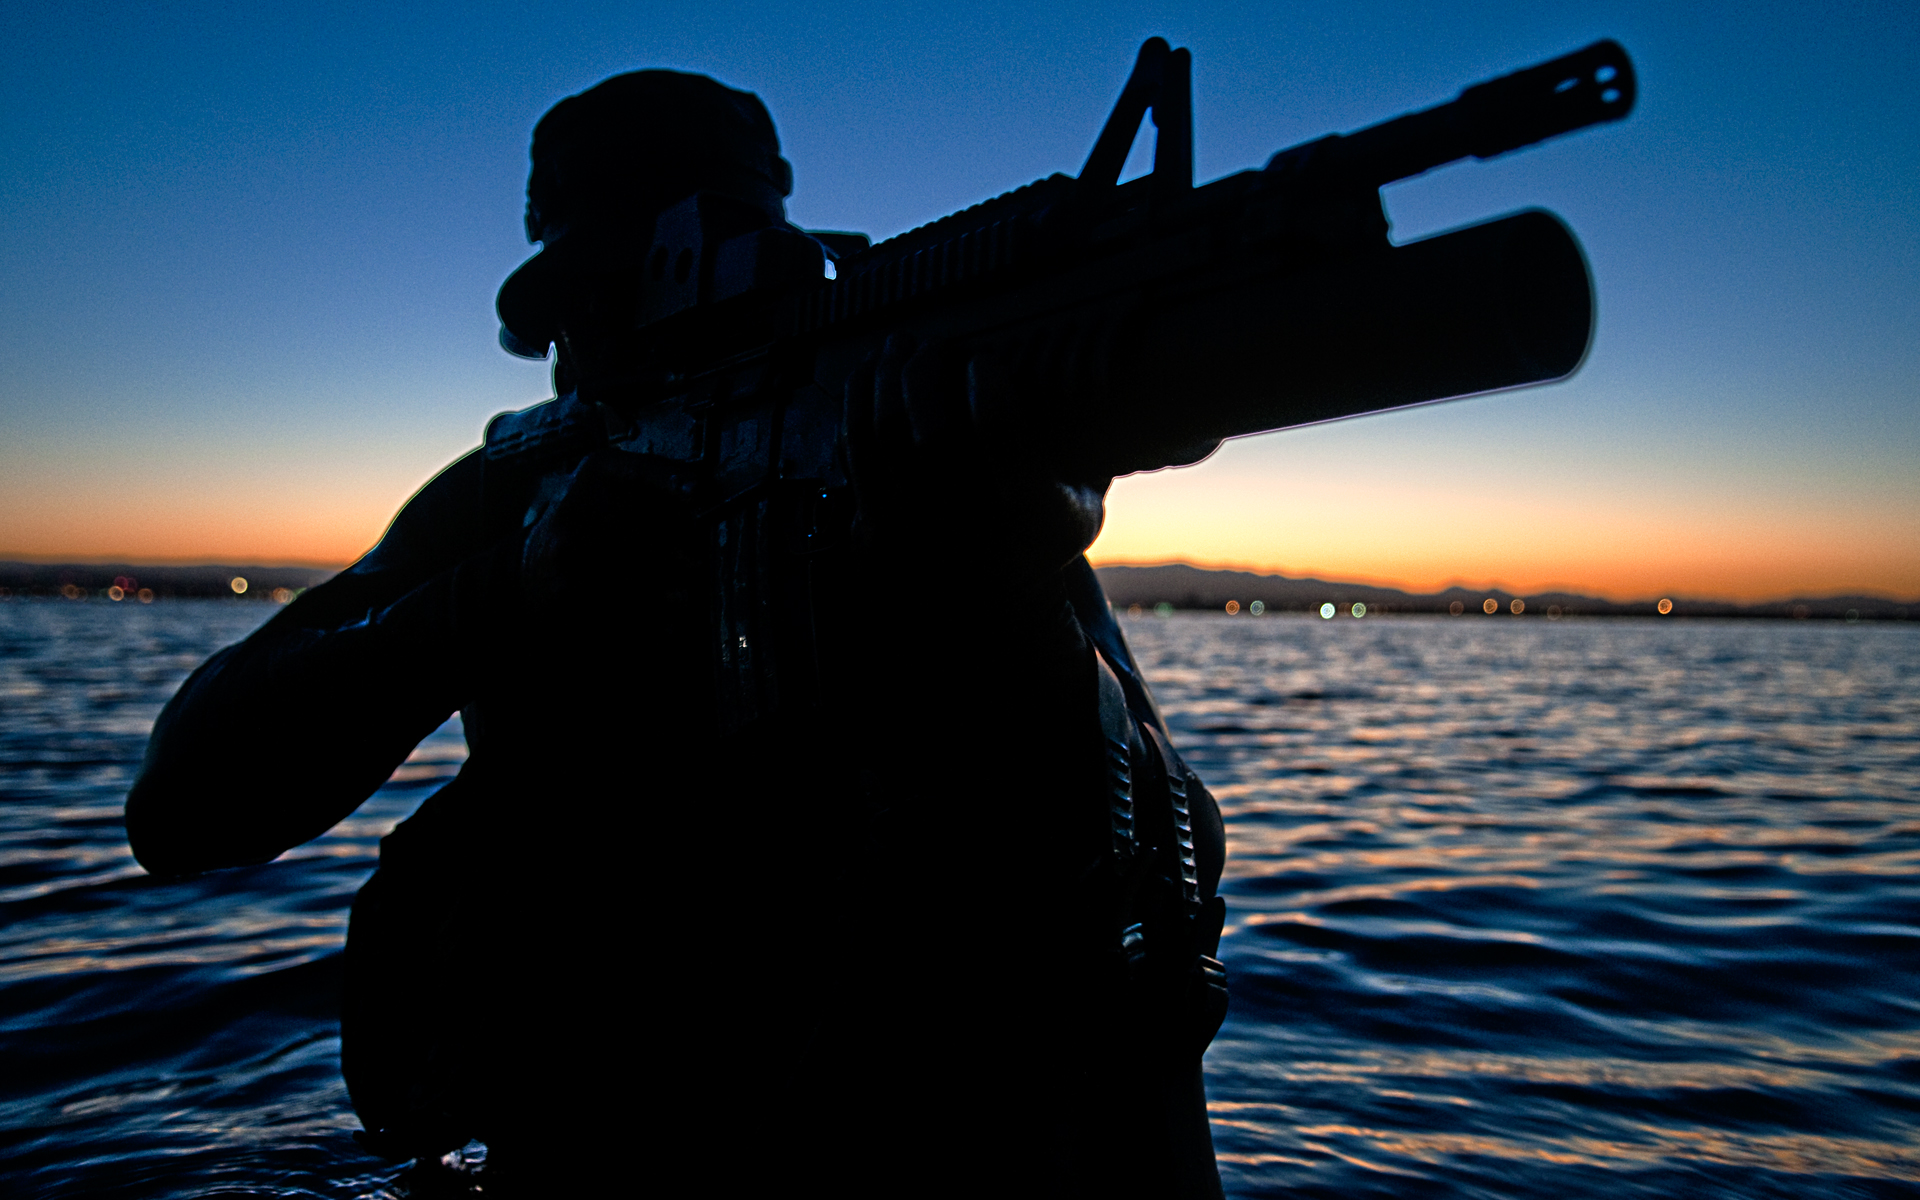 FileUnited States Navy SEALs 292jpg   Wikimedia Commons 1920x1200